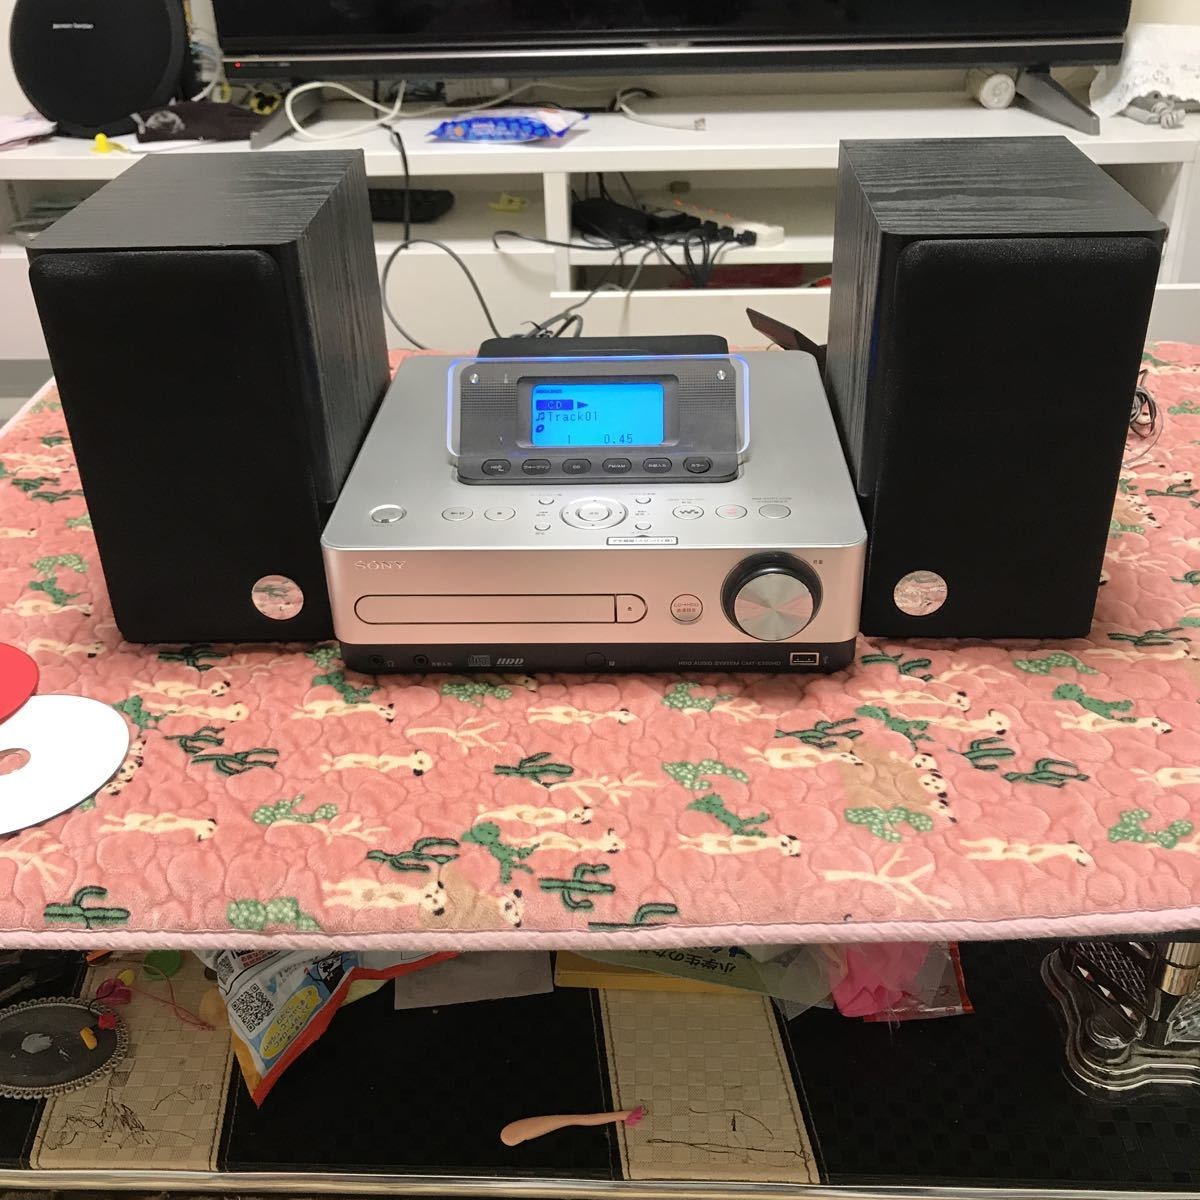 SONY ソニー システムステレオ HDDコンポ CMT-E350HD シルバー 2010年製 音楽 CD ウォークマン リモコン無し 現状お渡し 中古品_画像2